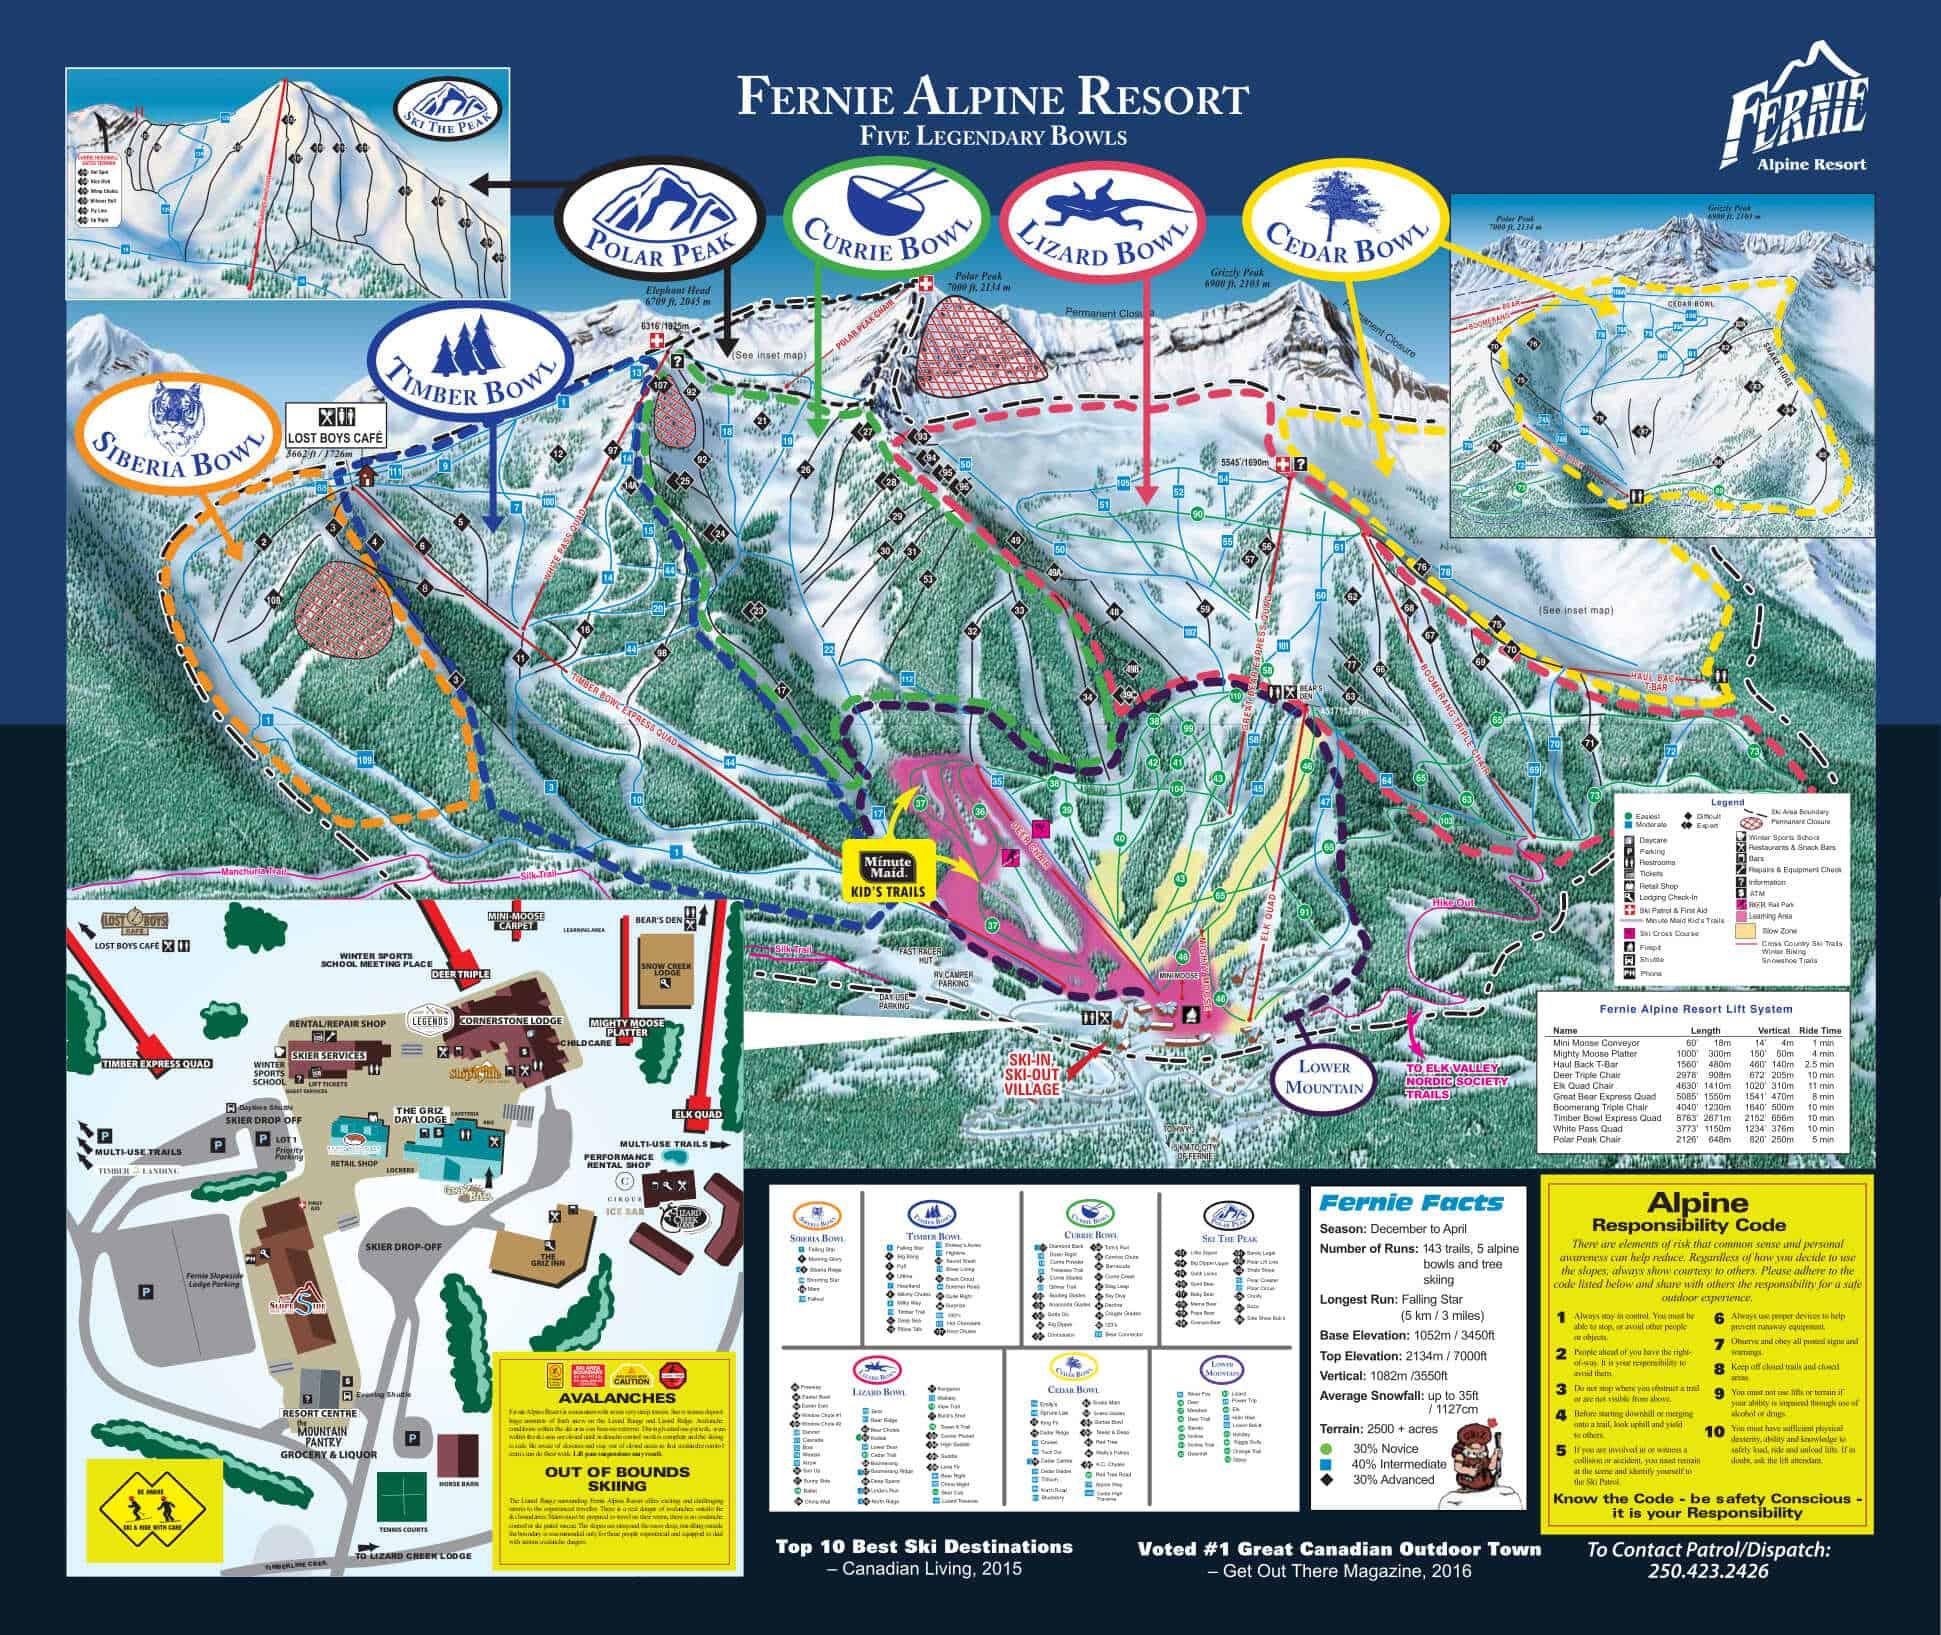 Fernie Alpine Resort Ski Trail Map 2019 optimized